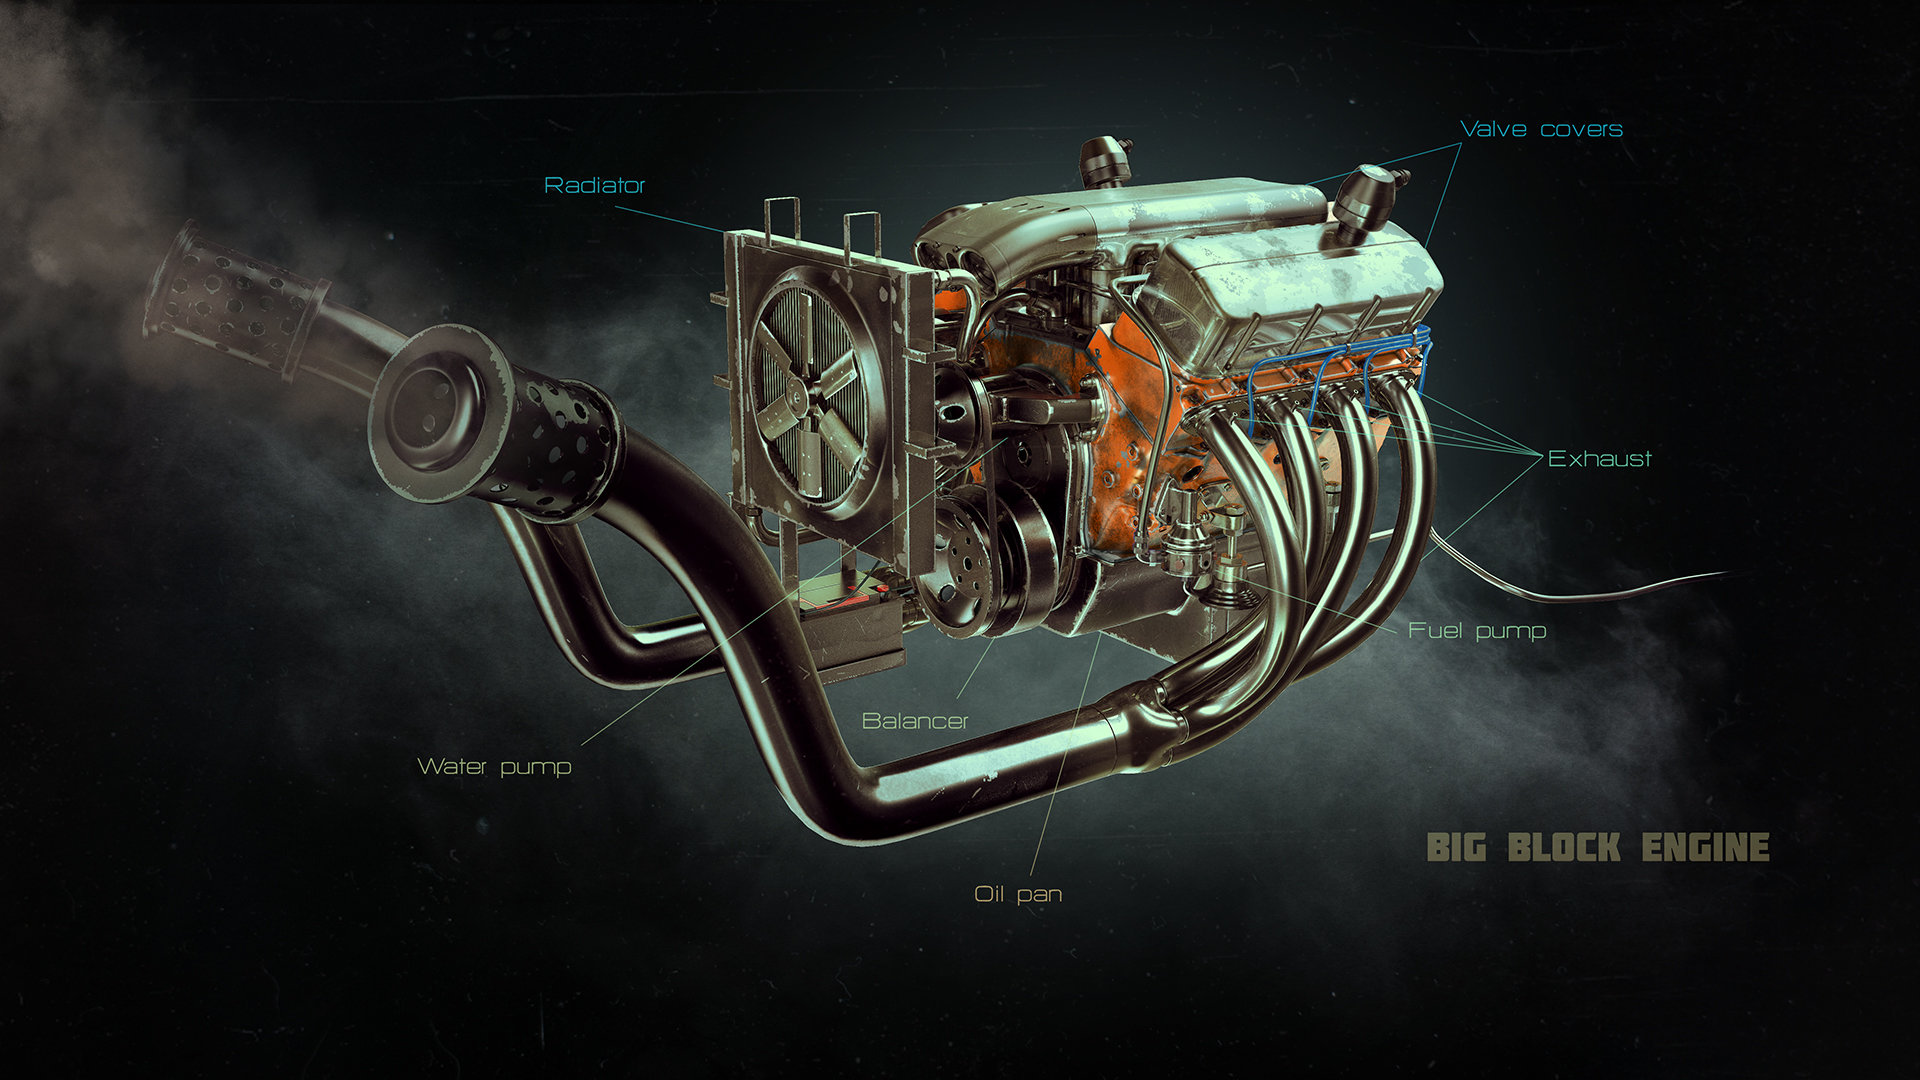 Alexandr novitskiy big block engine 01